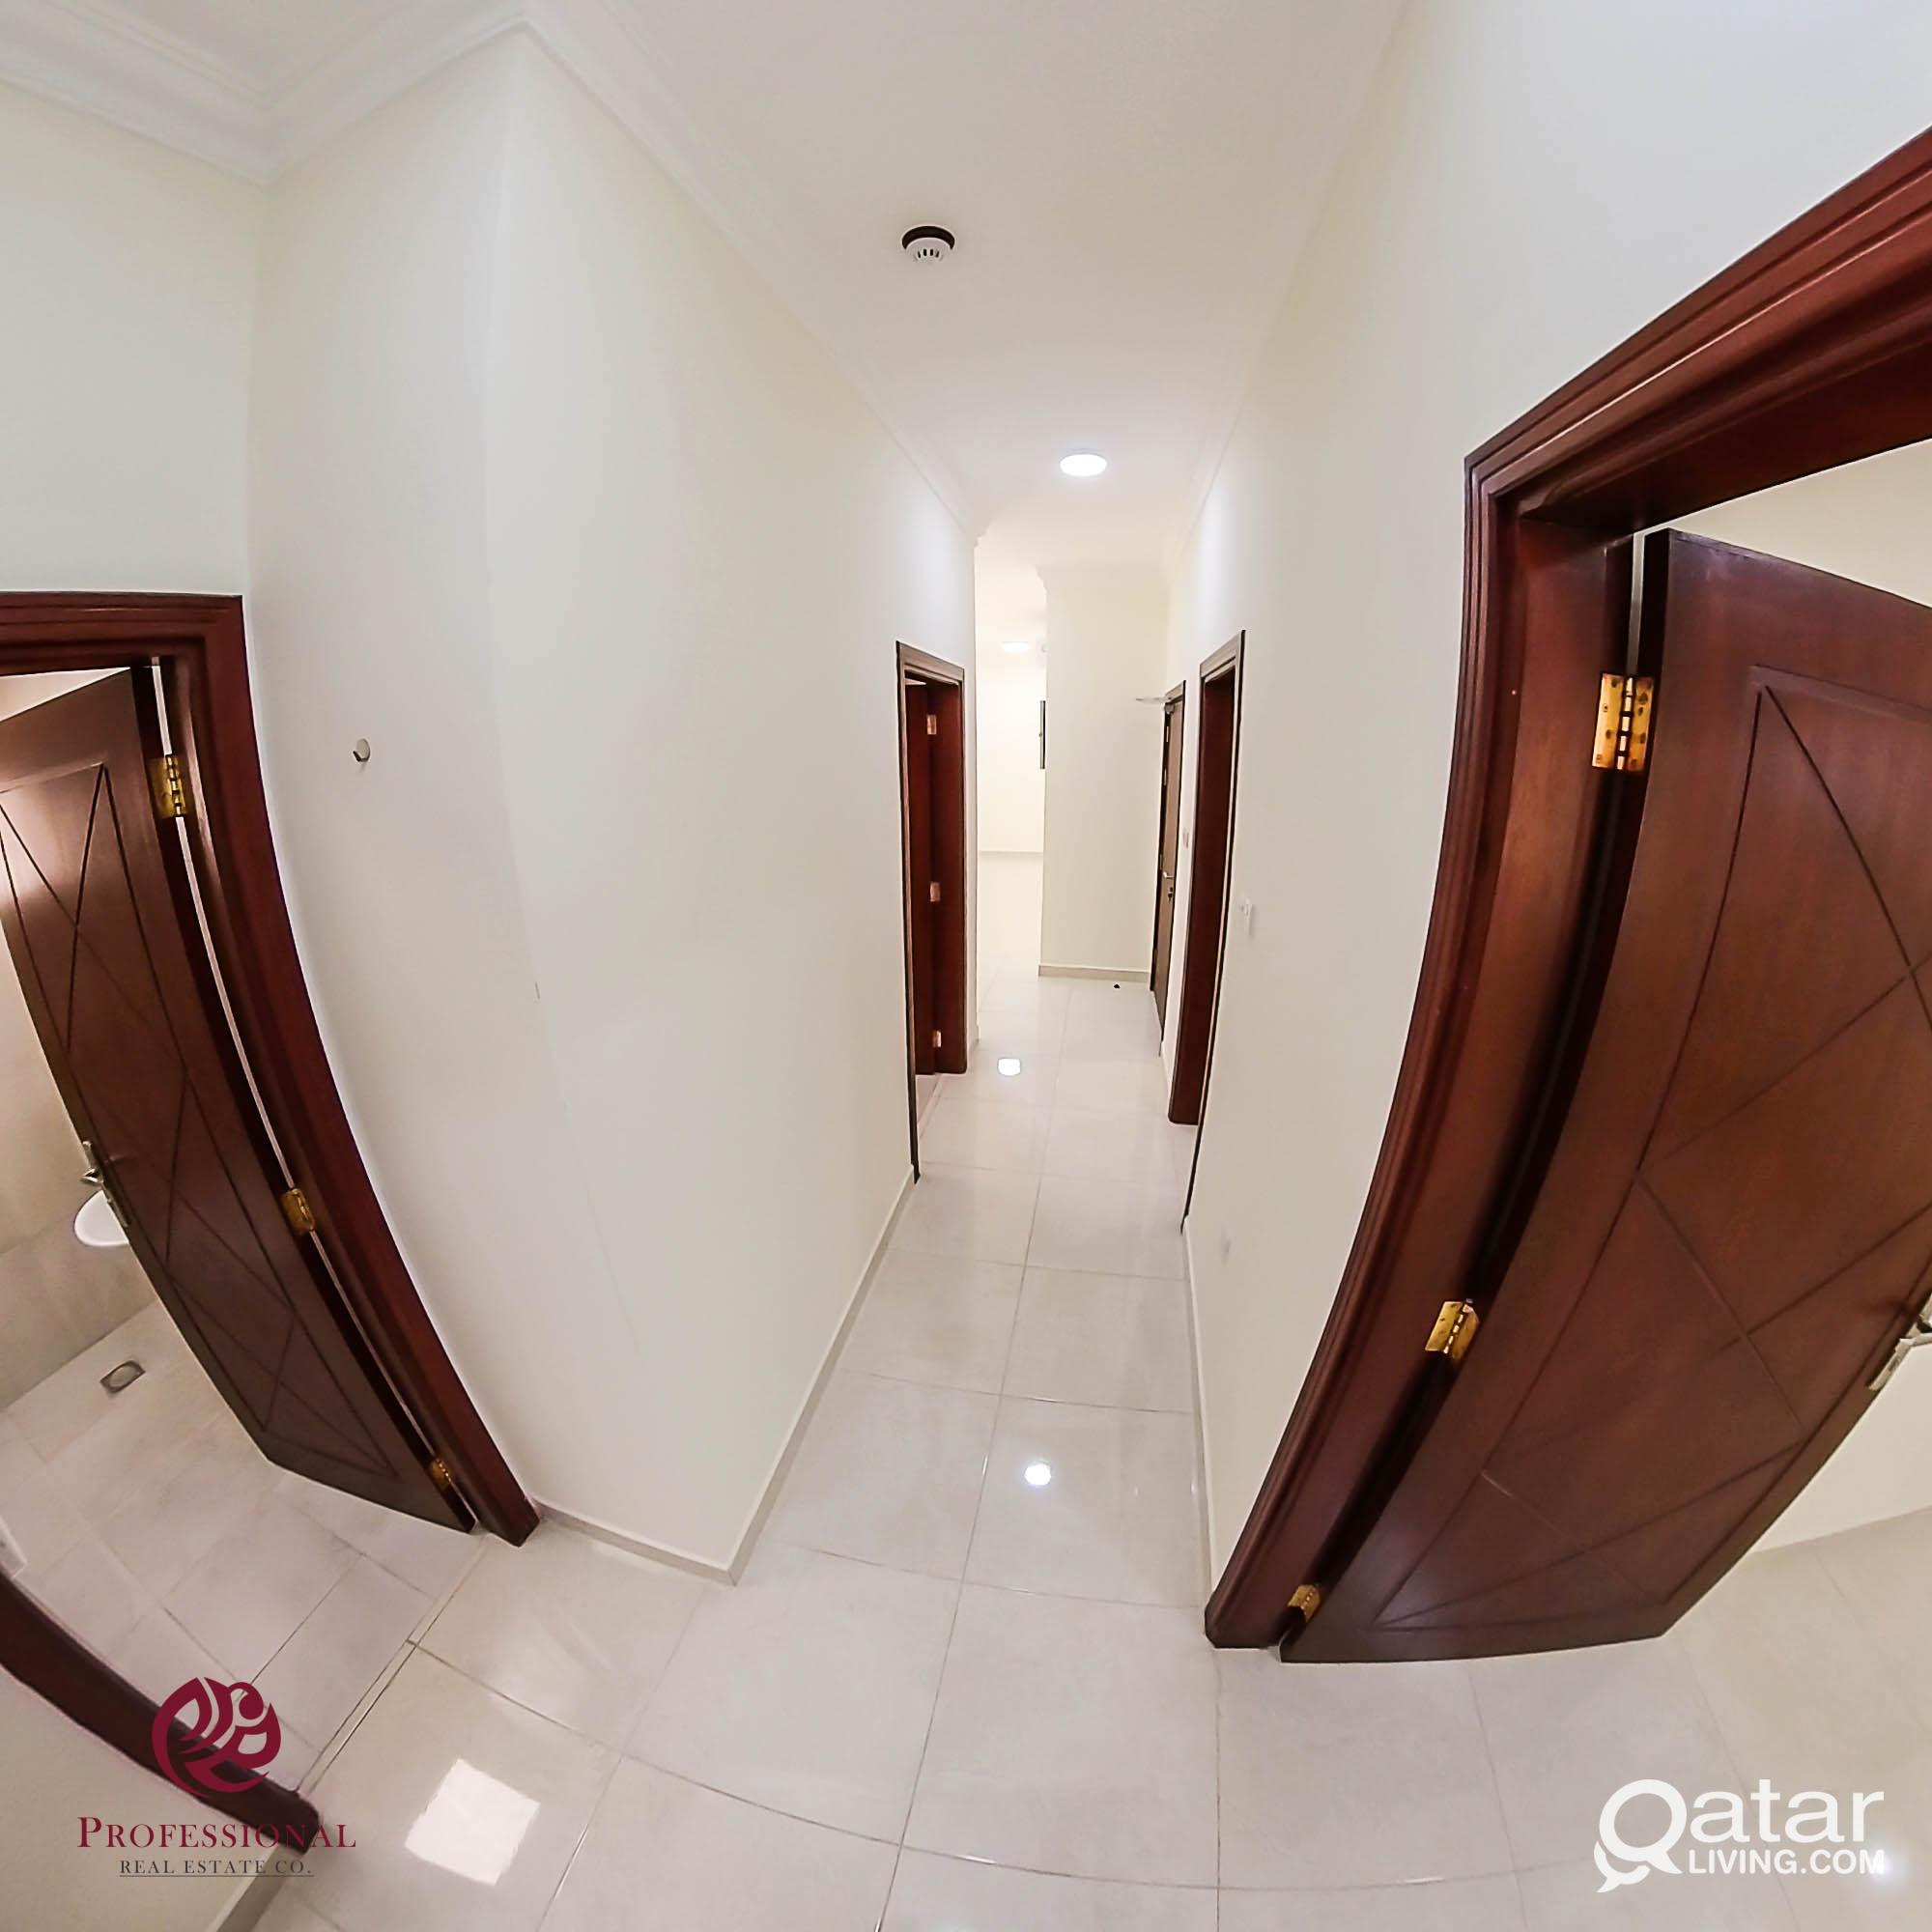 Unfurnished, 2 BHK Apartment in Umm Ghuwailina nea